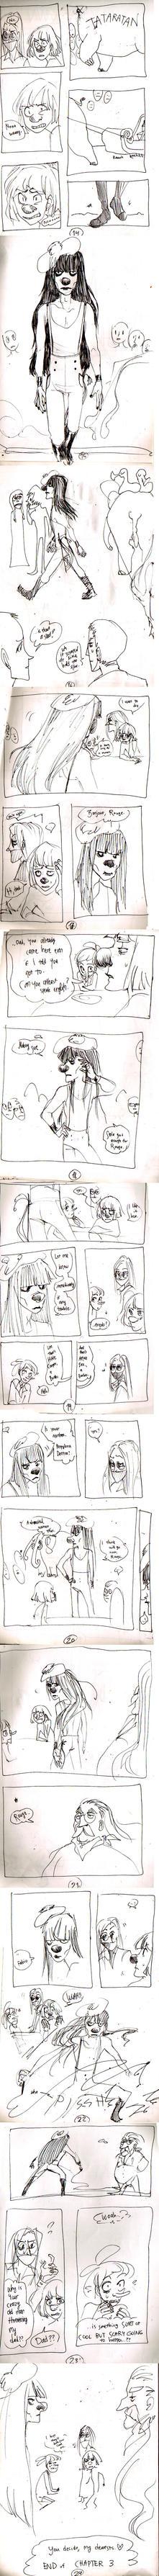 STOLA 024 by stola-comic